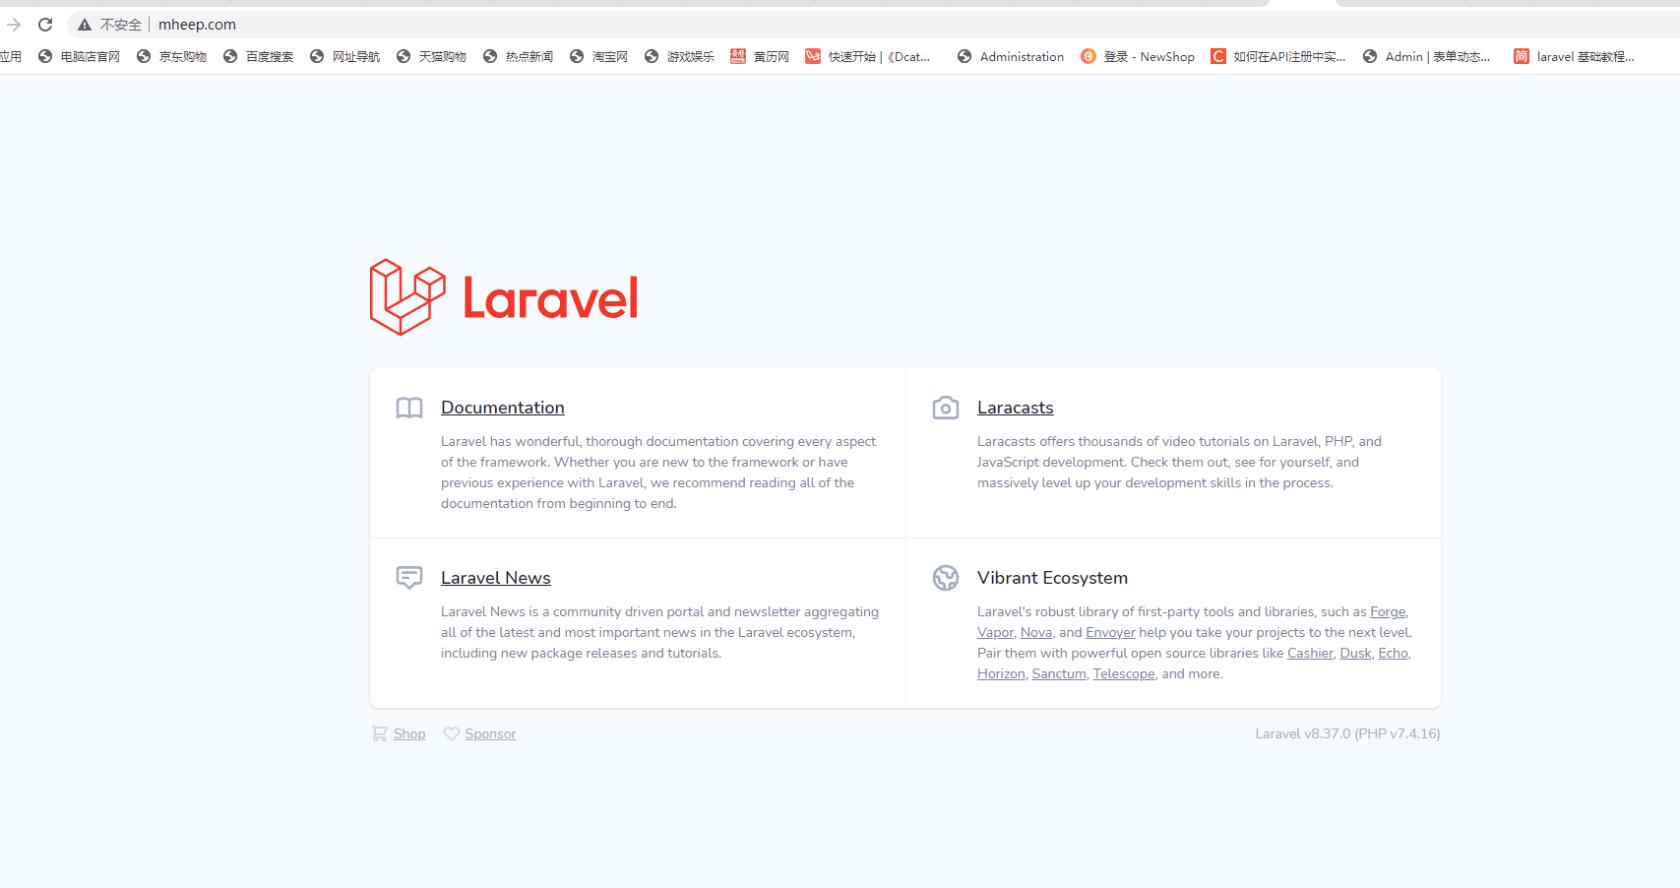 centos8.0安装php、nginx、mysql、redis、composer 搭建laravel项目